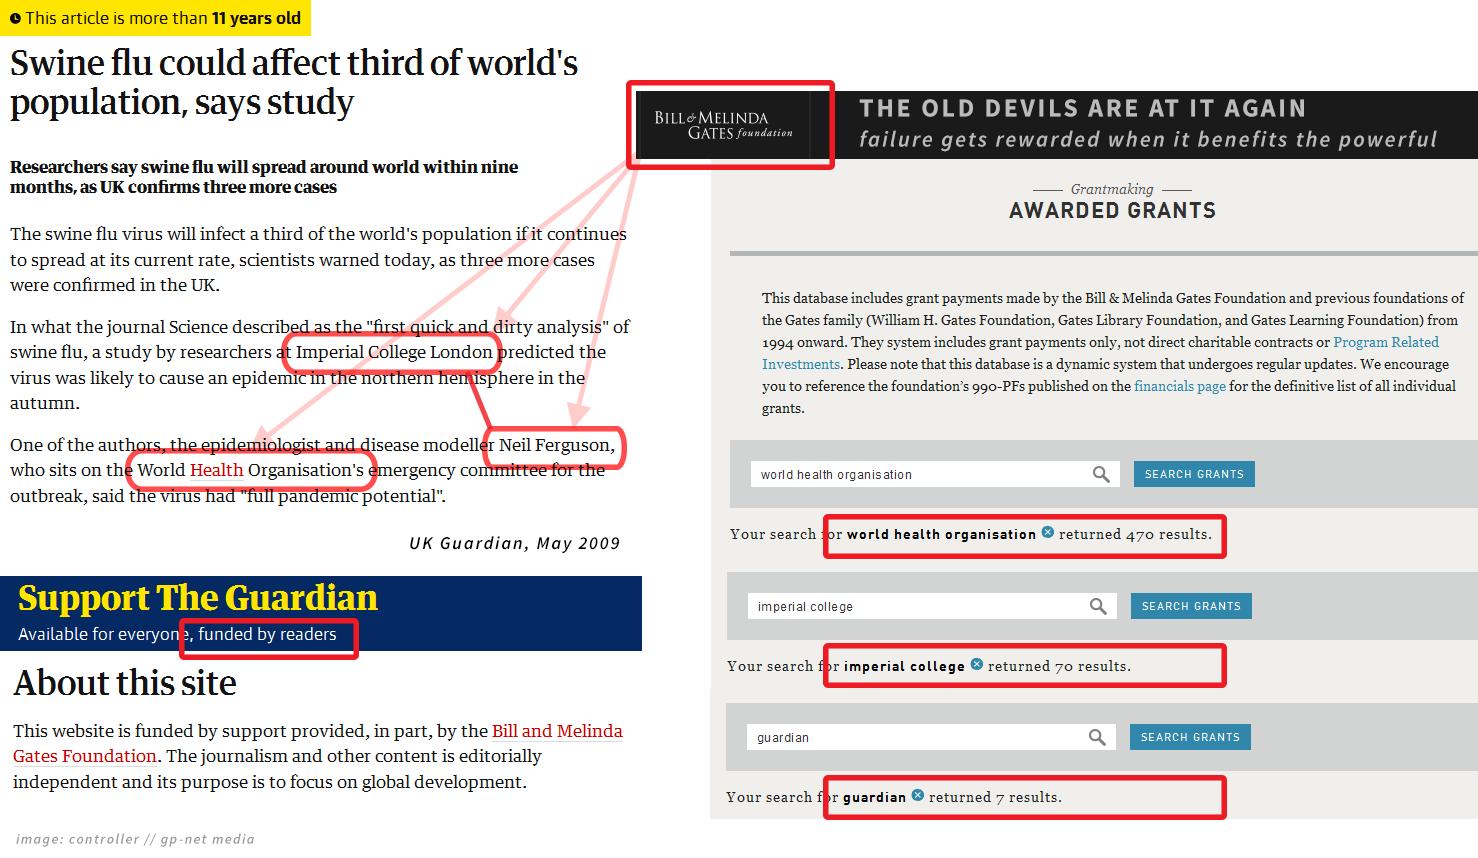 The Bill & Melinda Gates Foundation were so impressed with Ferguson's dishonest modelling during the 2009 Swine Flu prelude